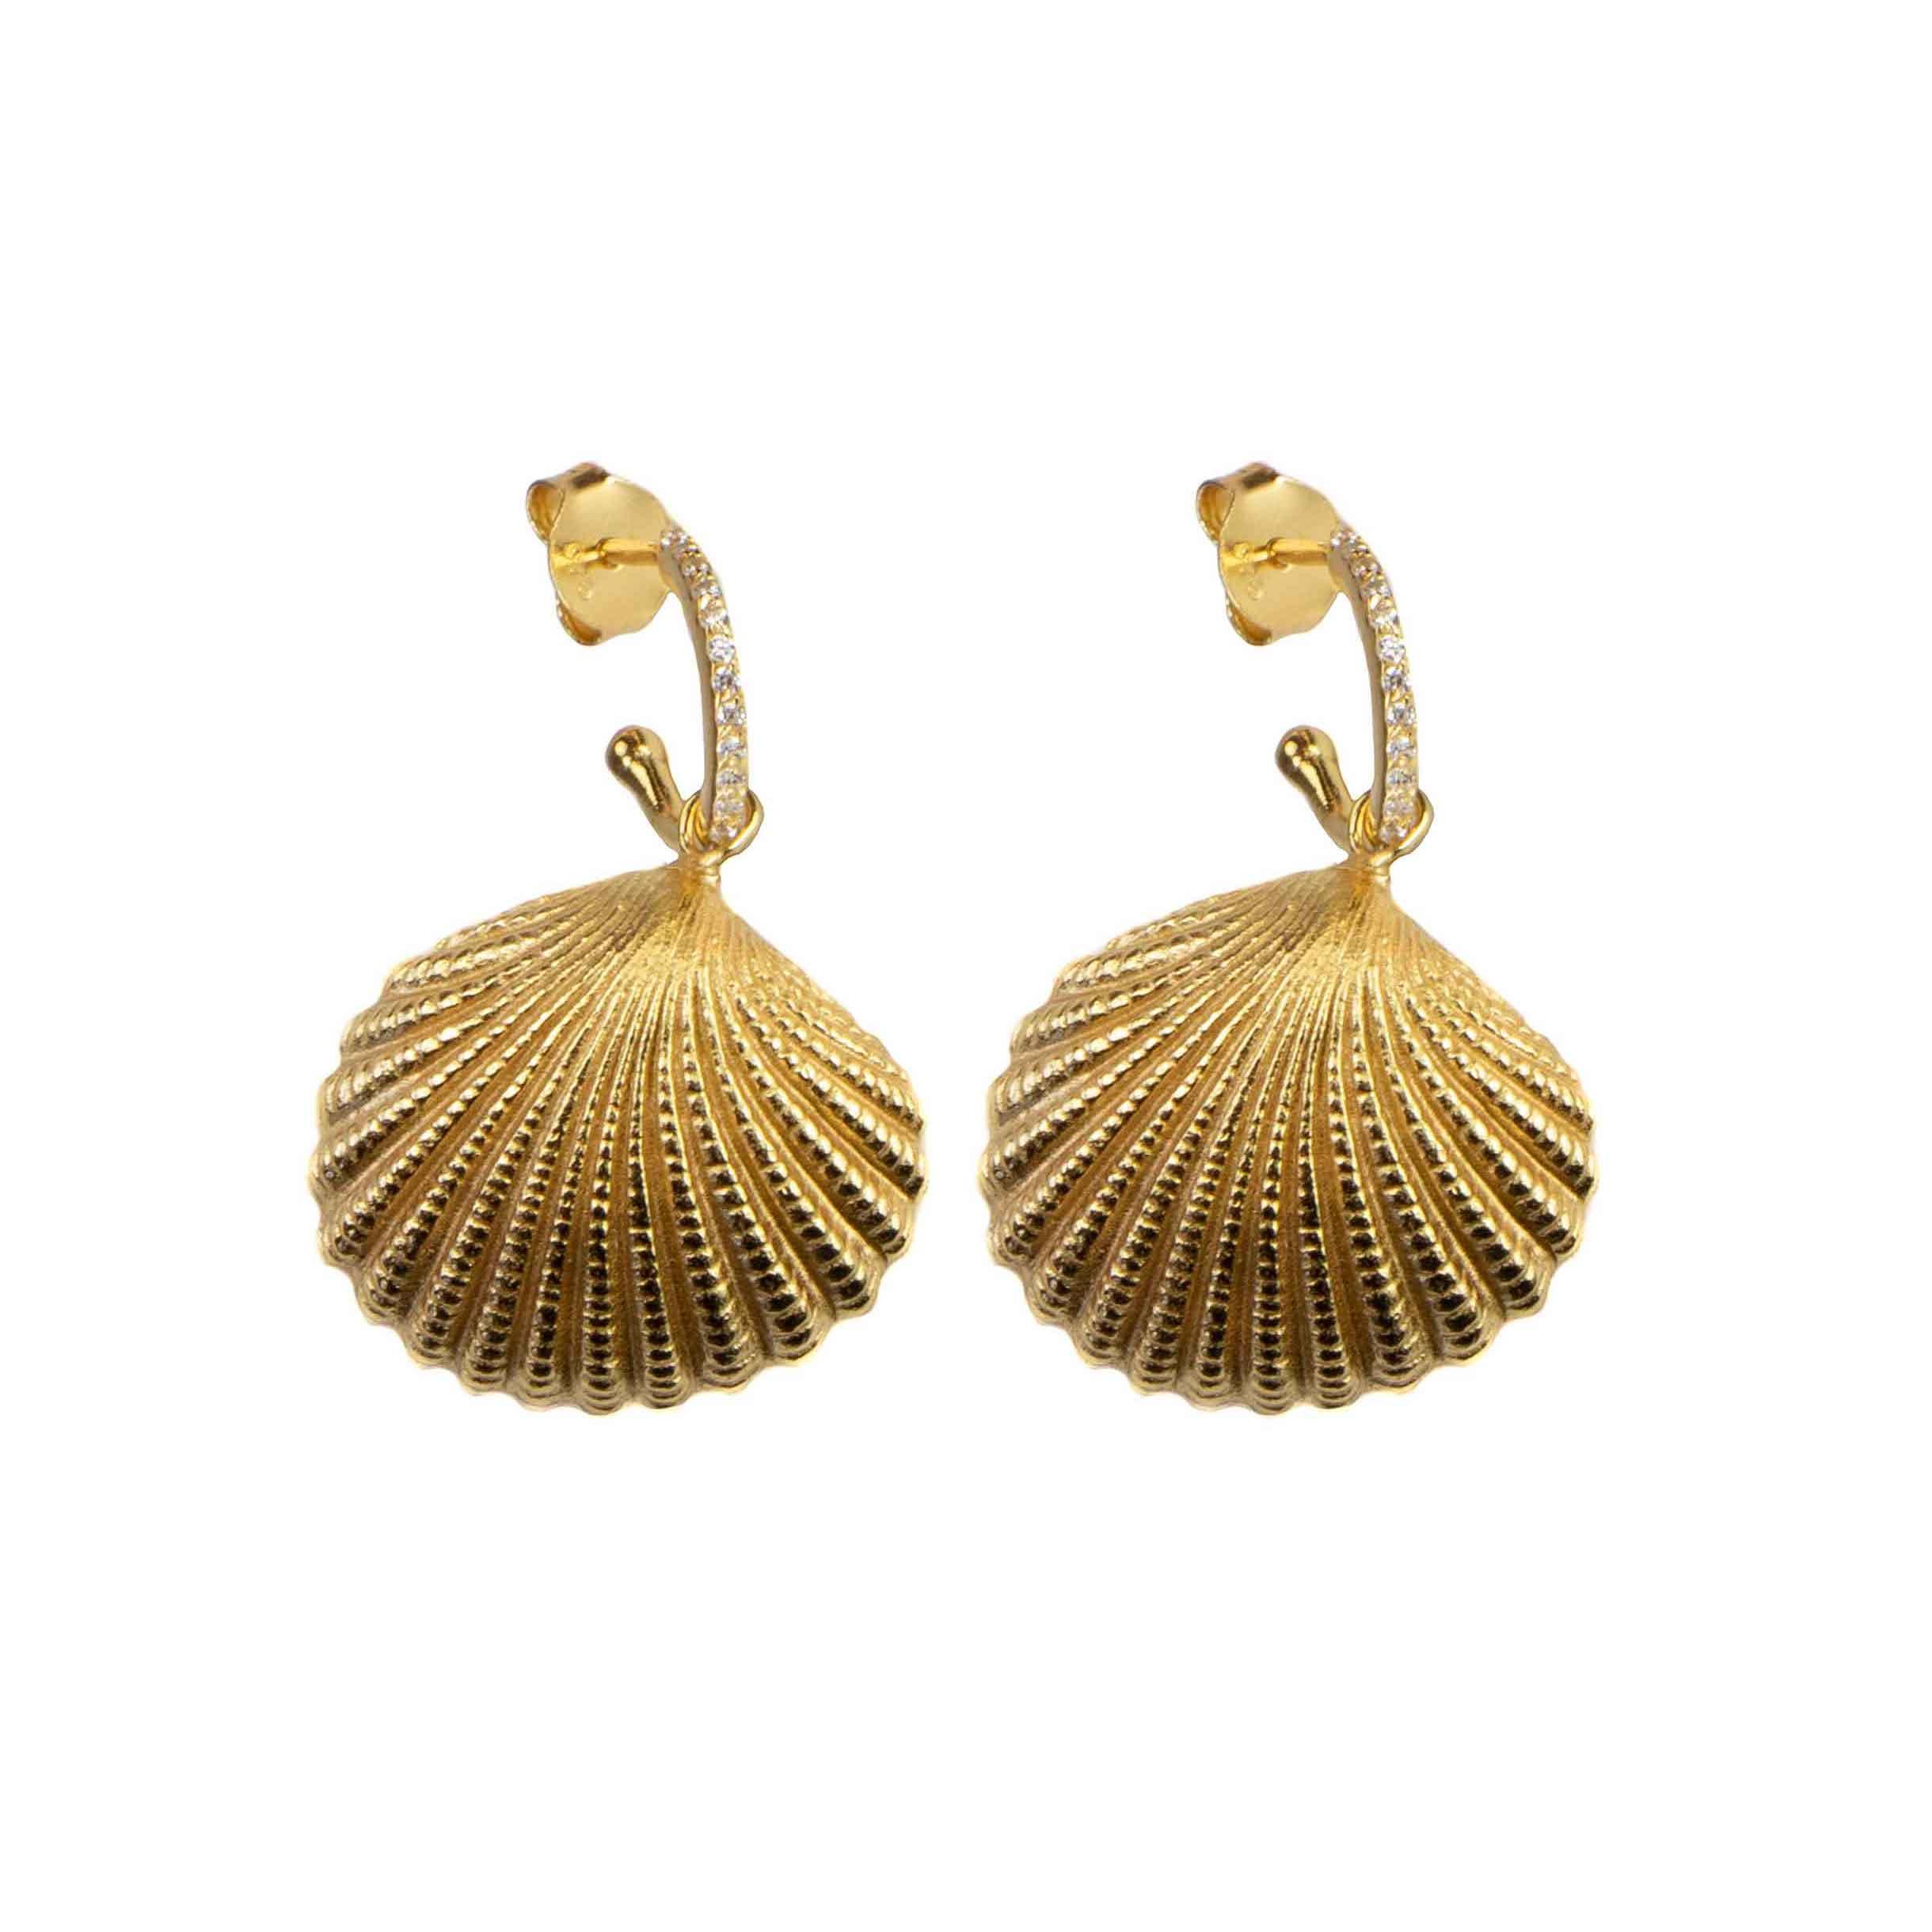 Hultquist Maurea Earrings Gold S05021G